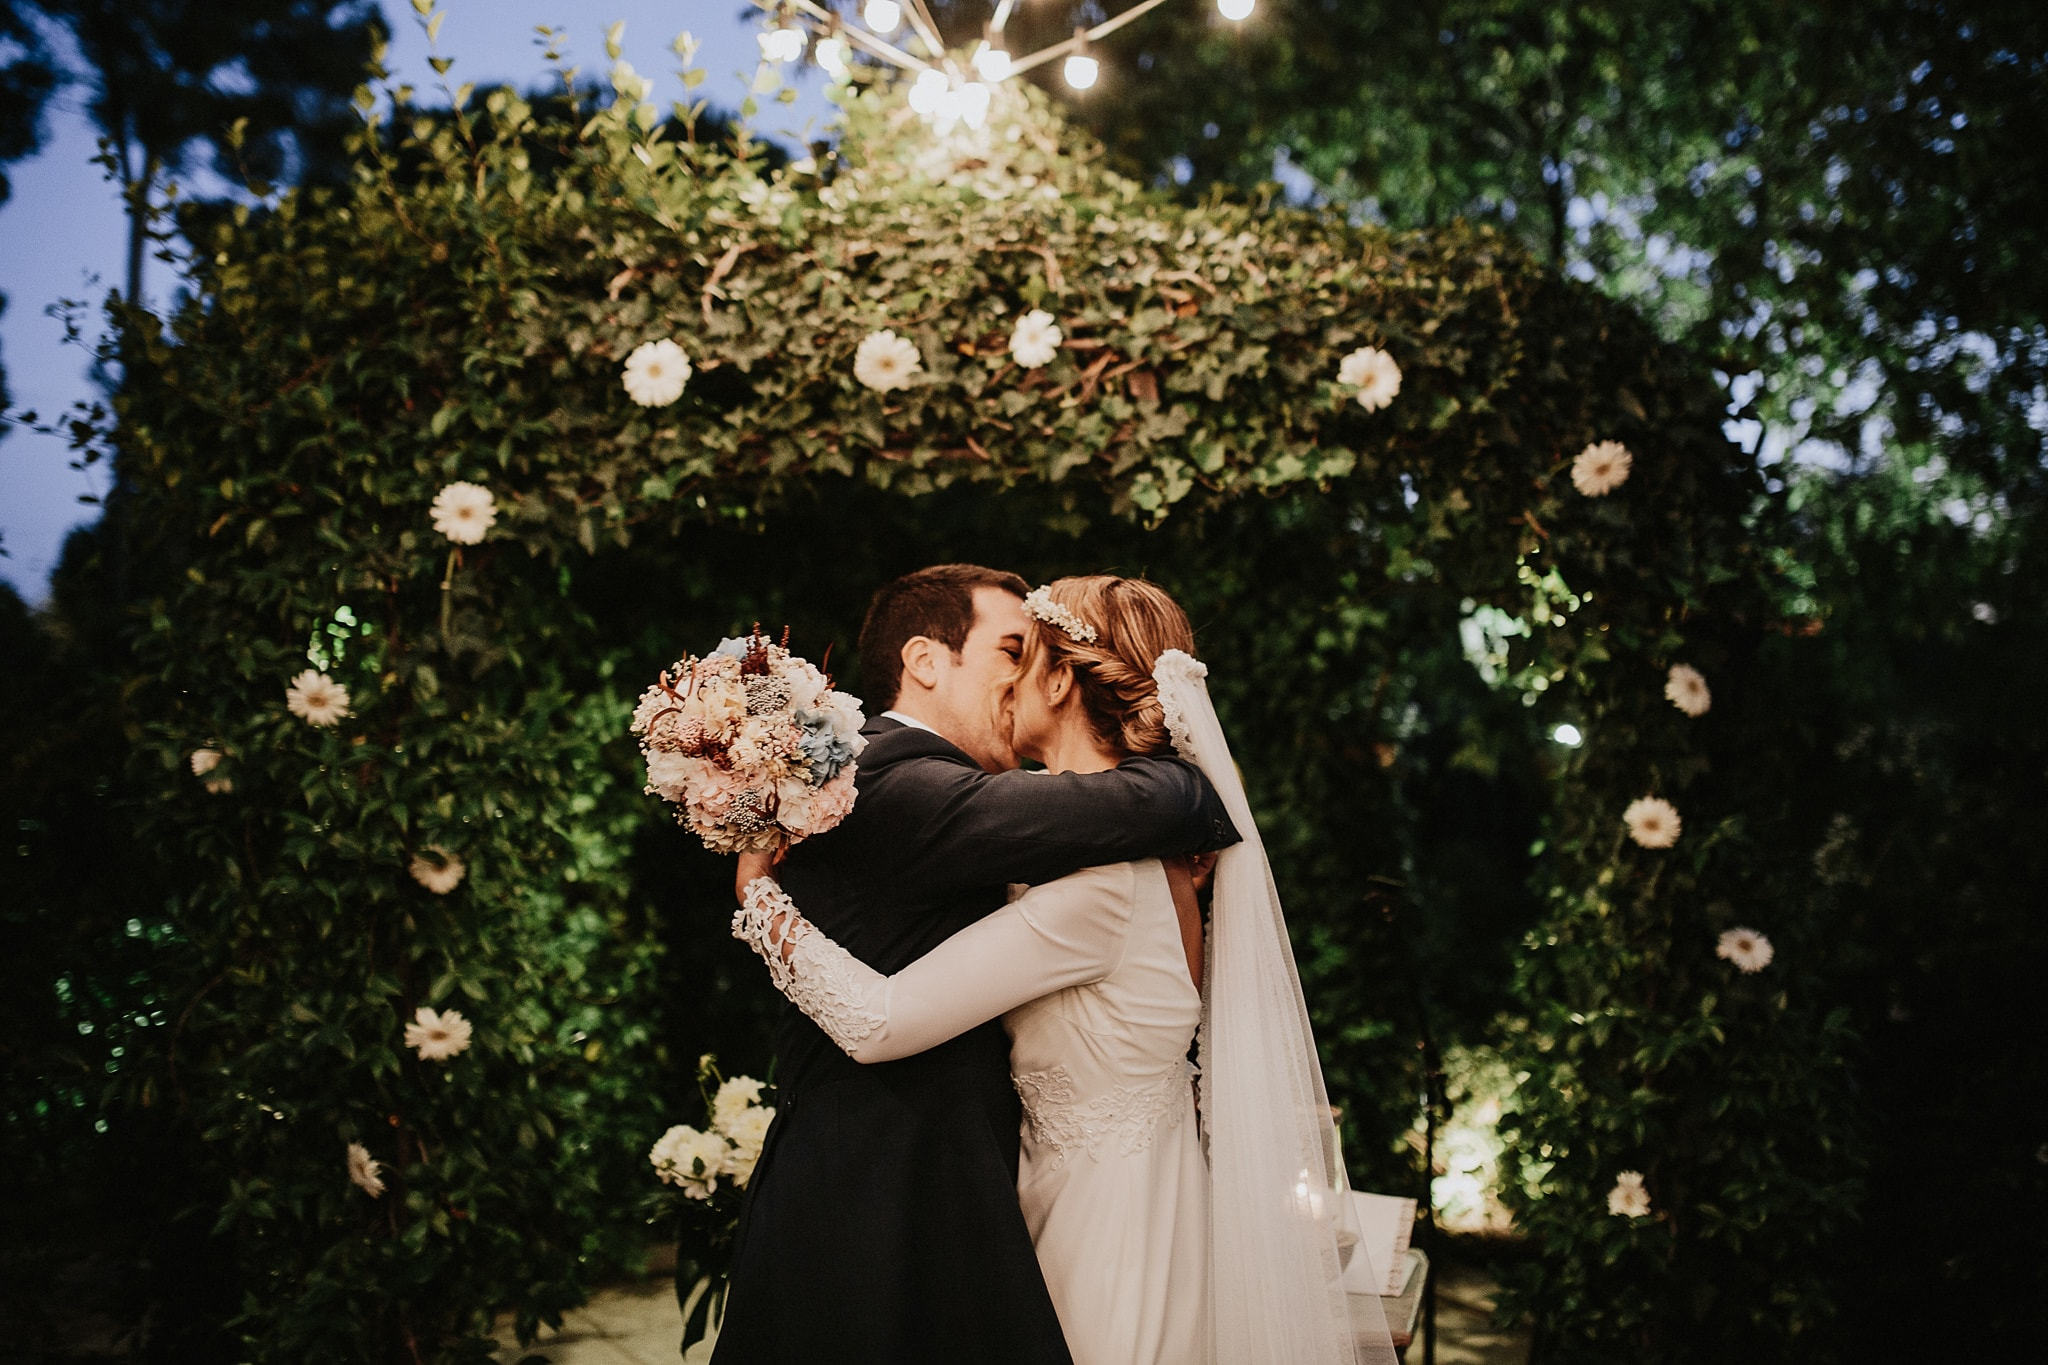 prisma-blanco-fotografos-bodas-toledo-134